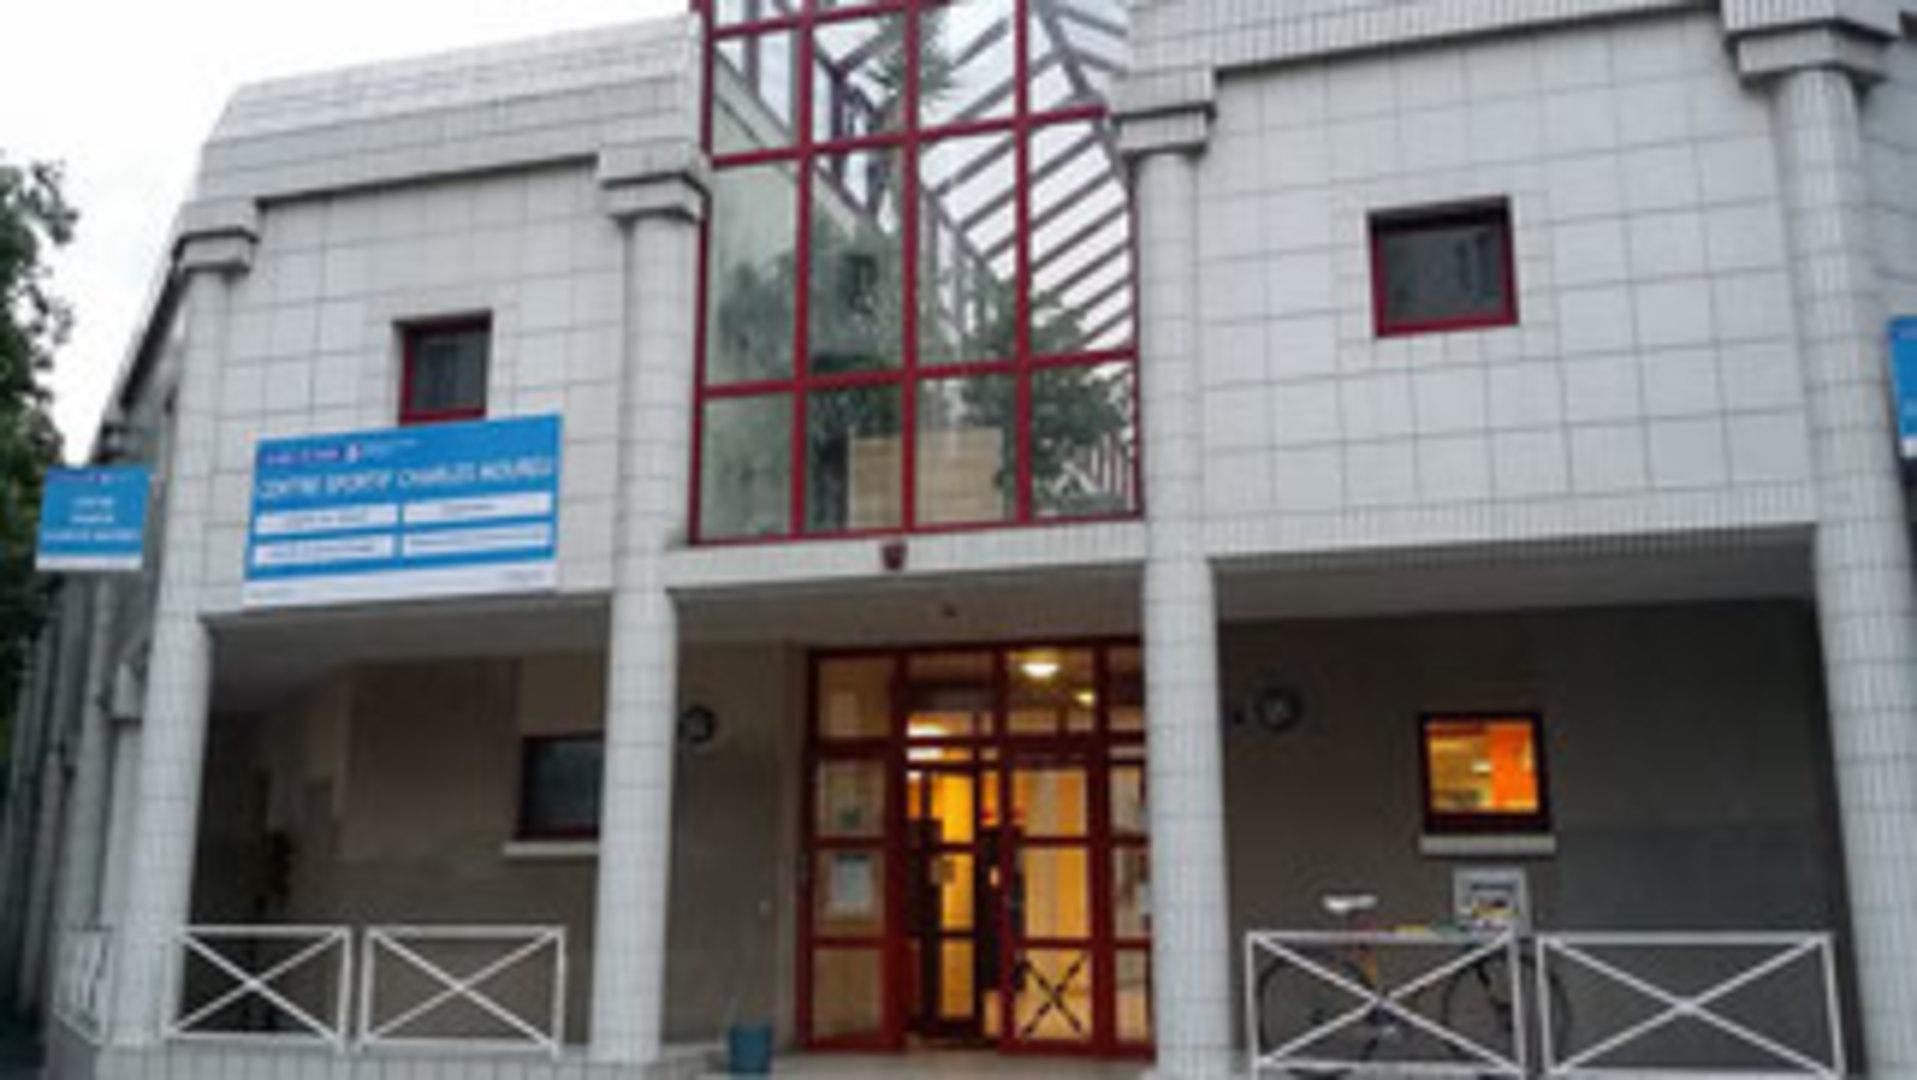 Gymnase Charles Moureu